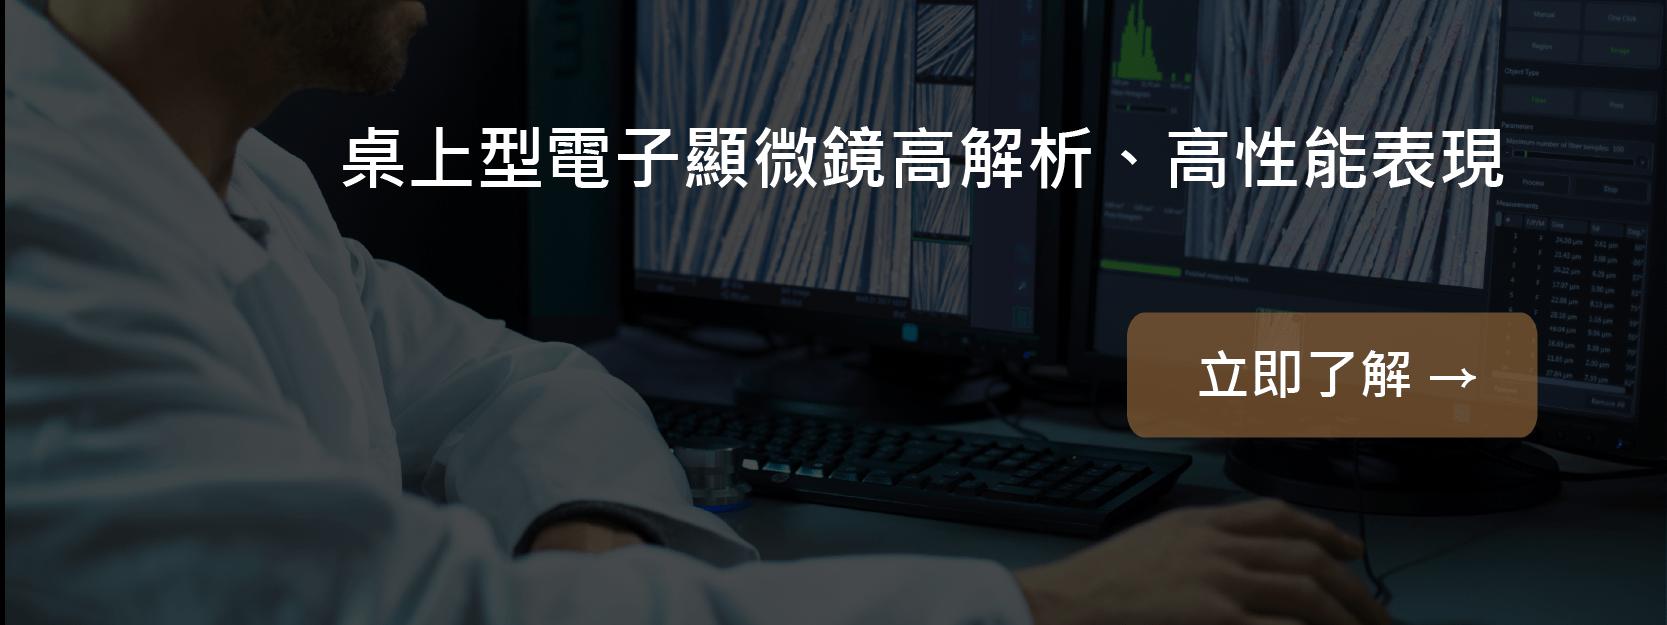 how-desktopSEM-high-resolution-image